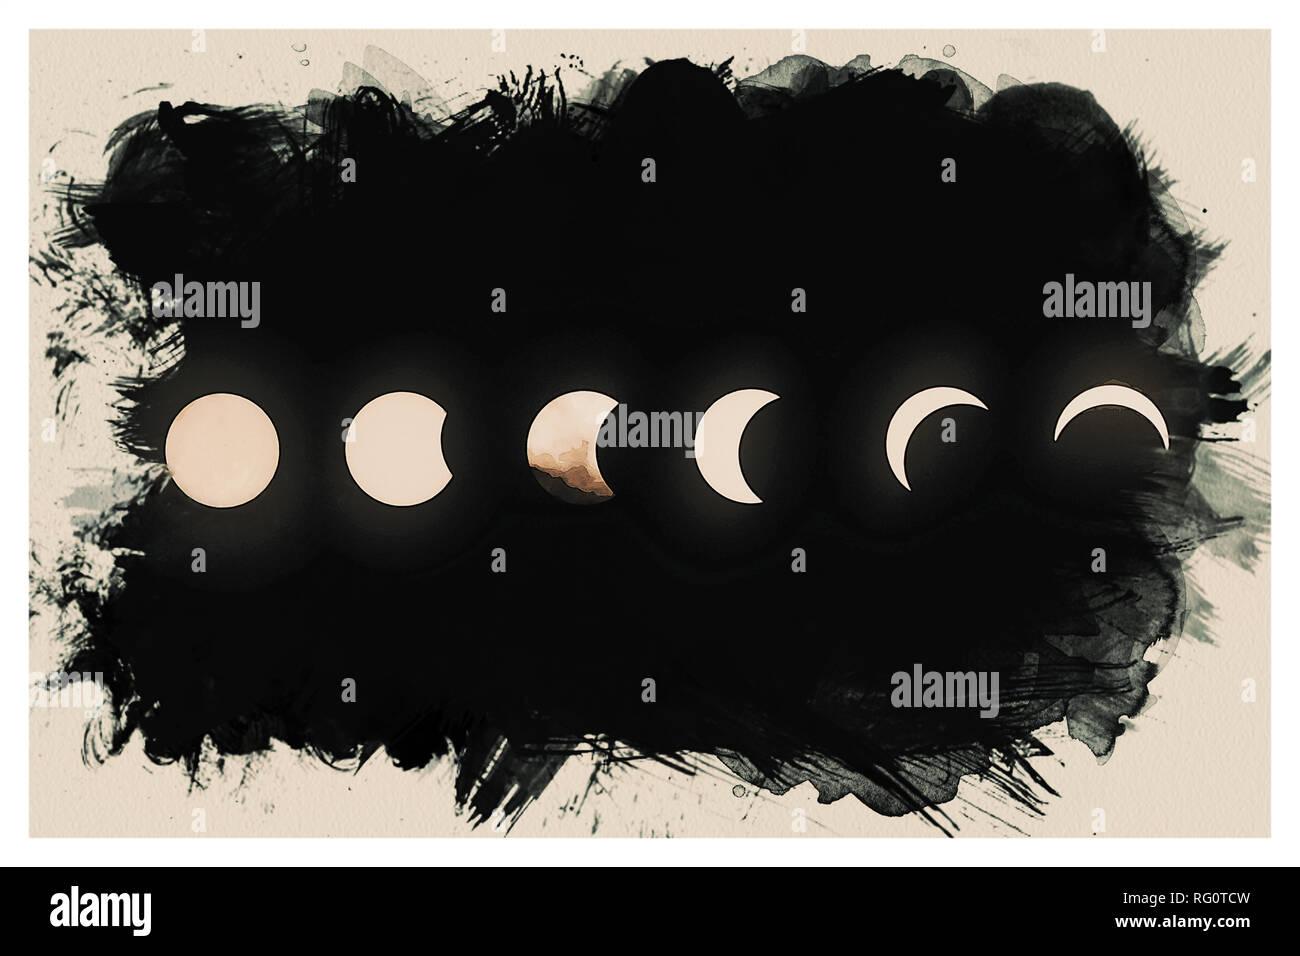 Solar Eclipse Pantng.jpg - RG0TD0 - Stock Image